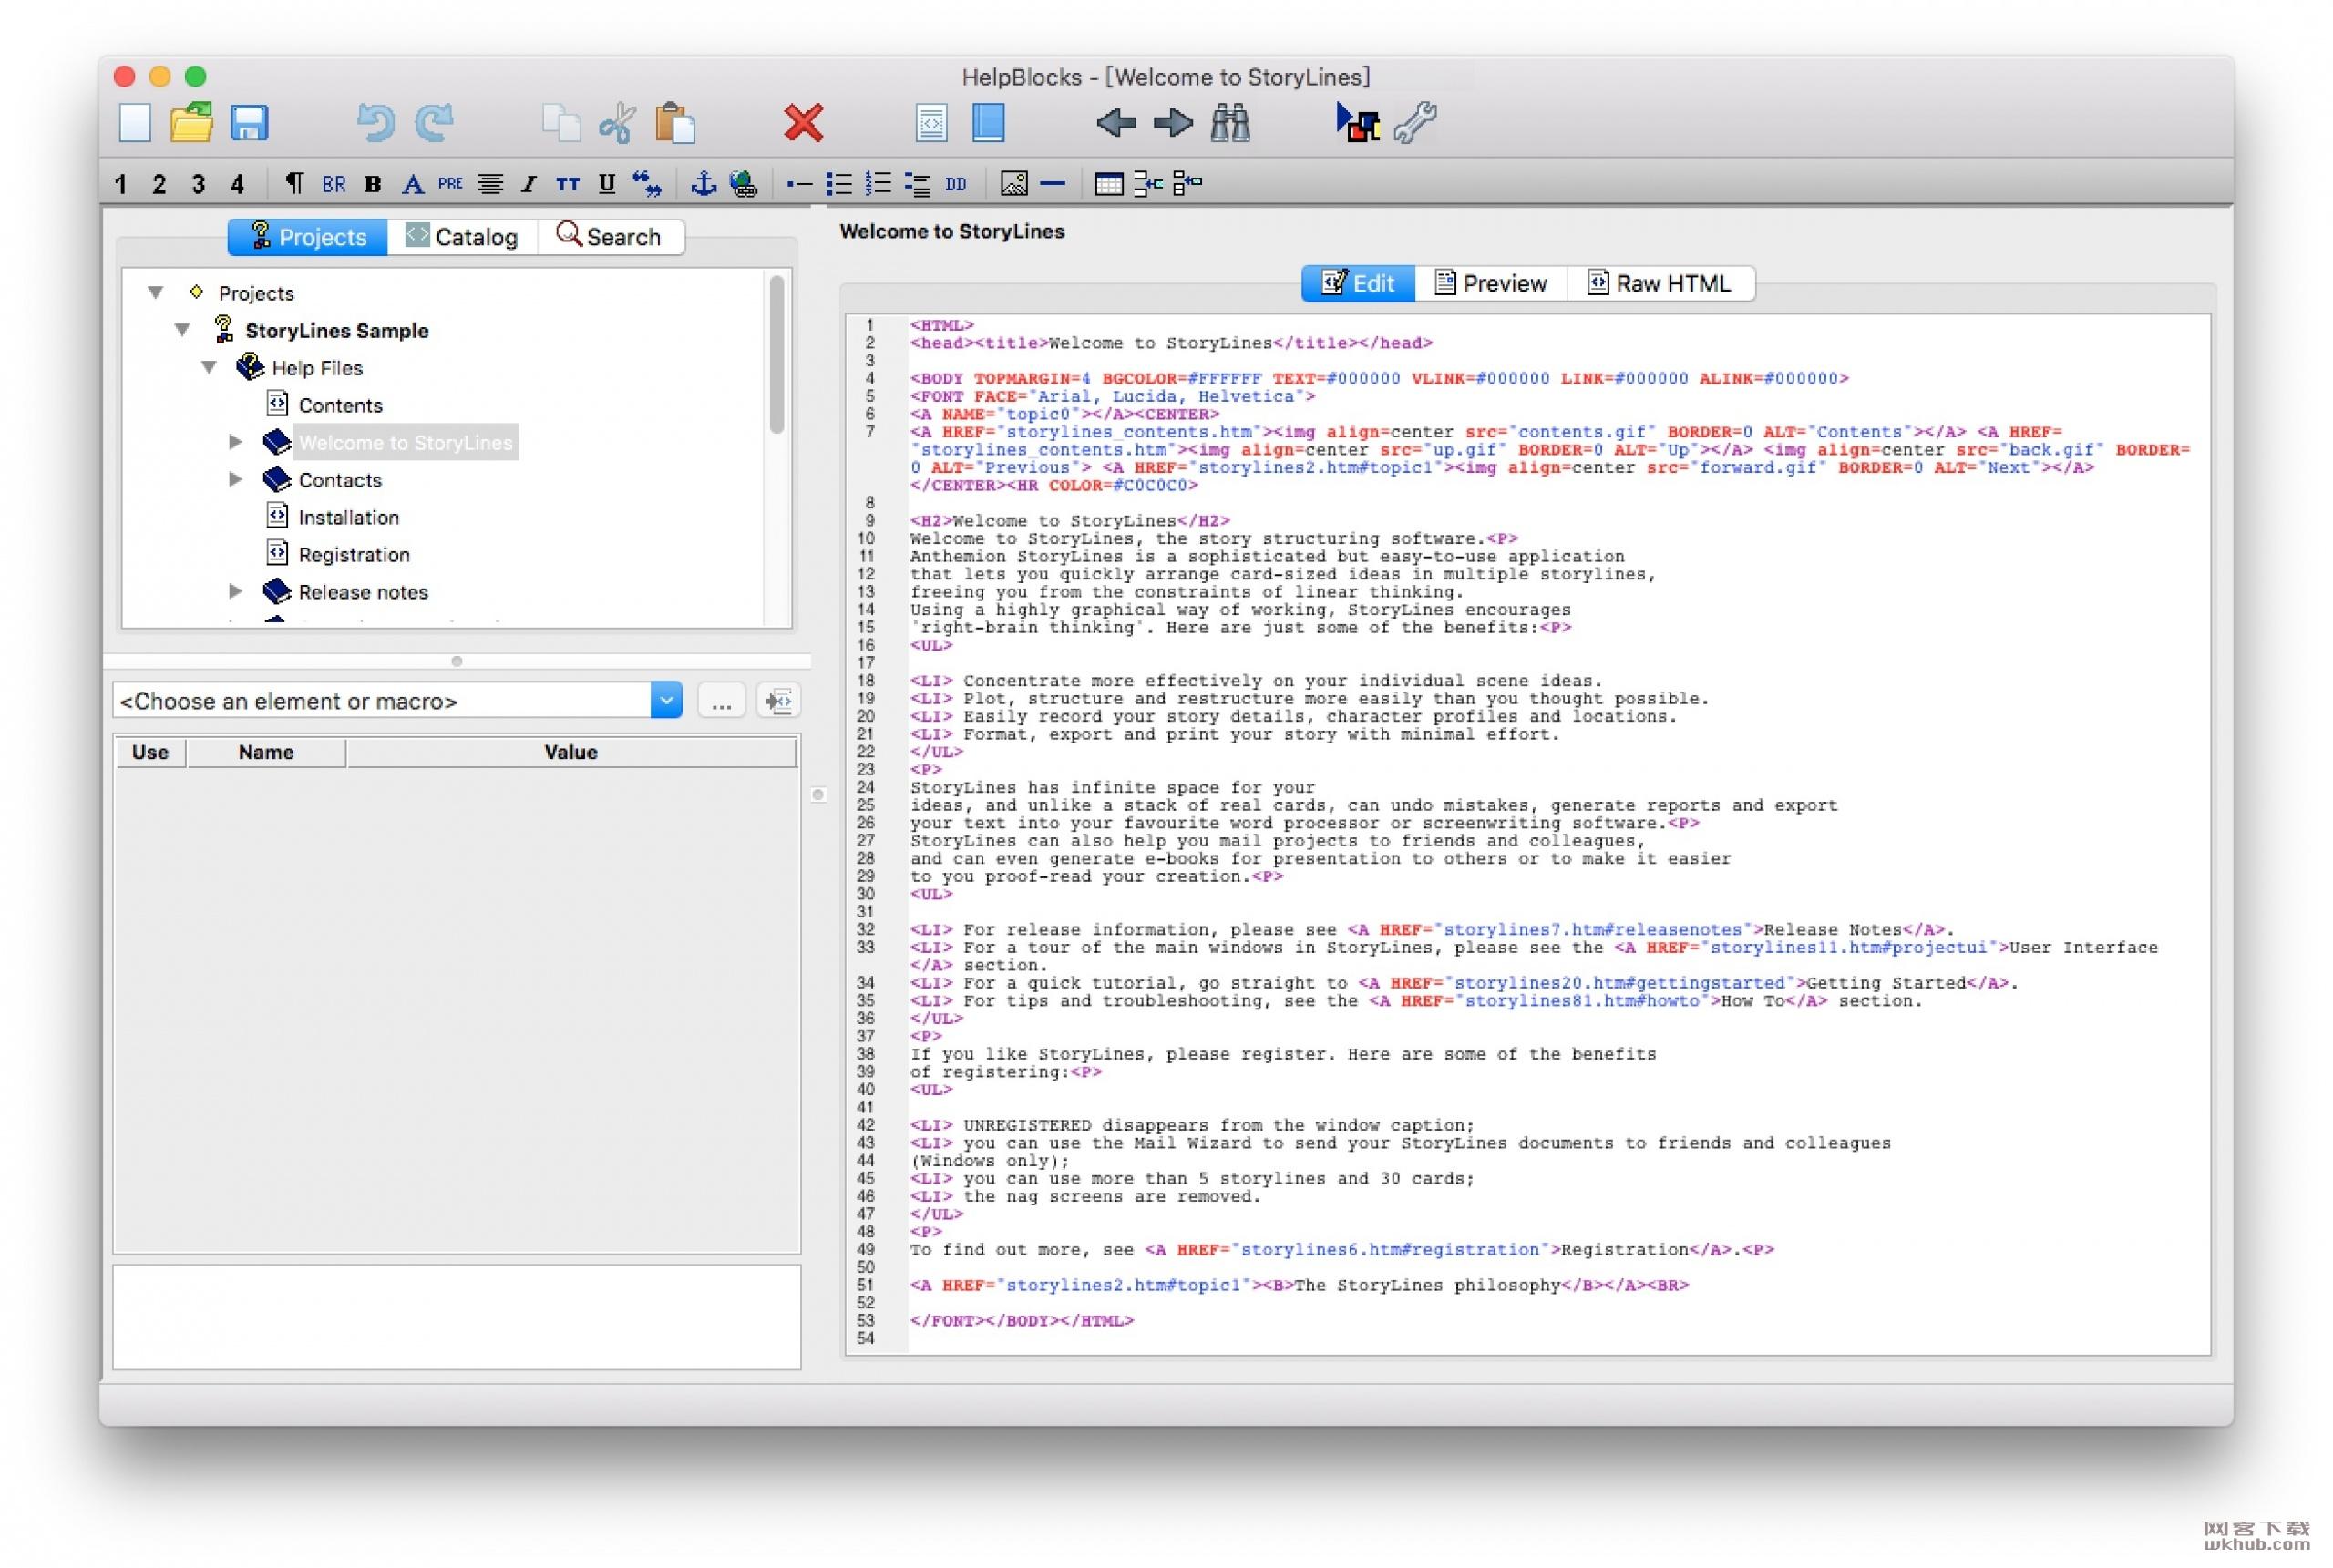 HelpBlocks 1.24 HTML帮助文件创作工具